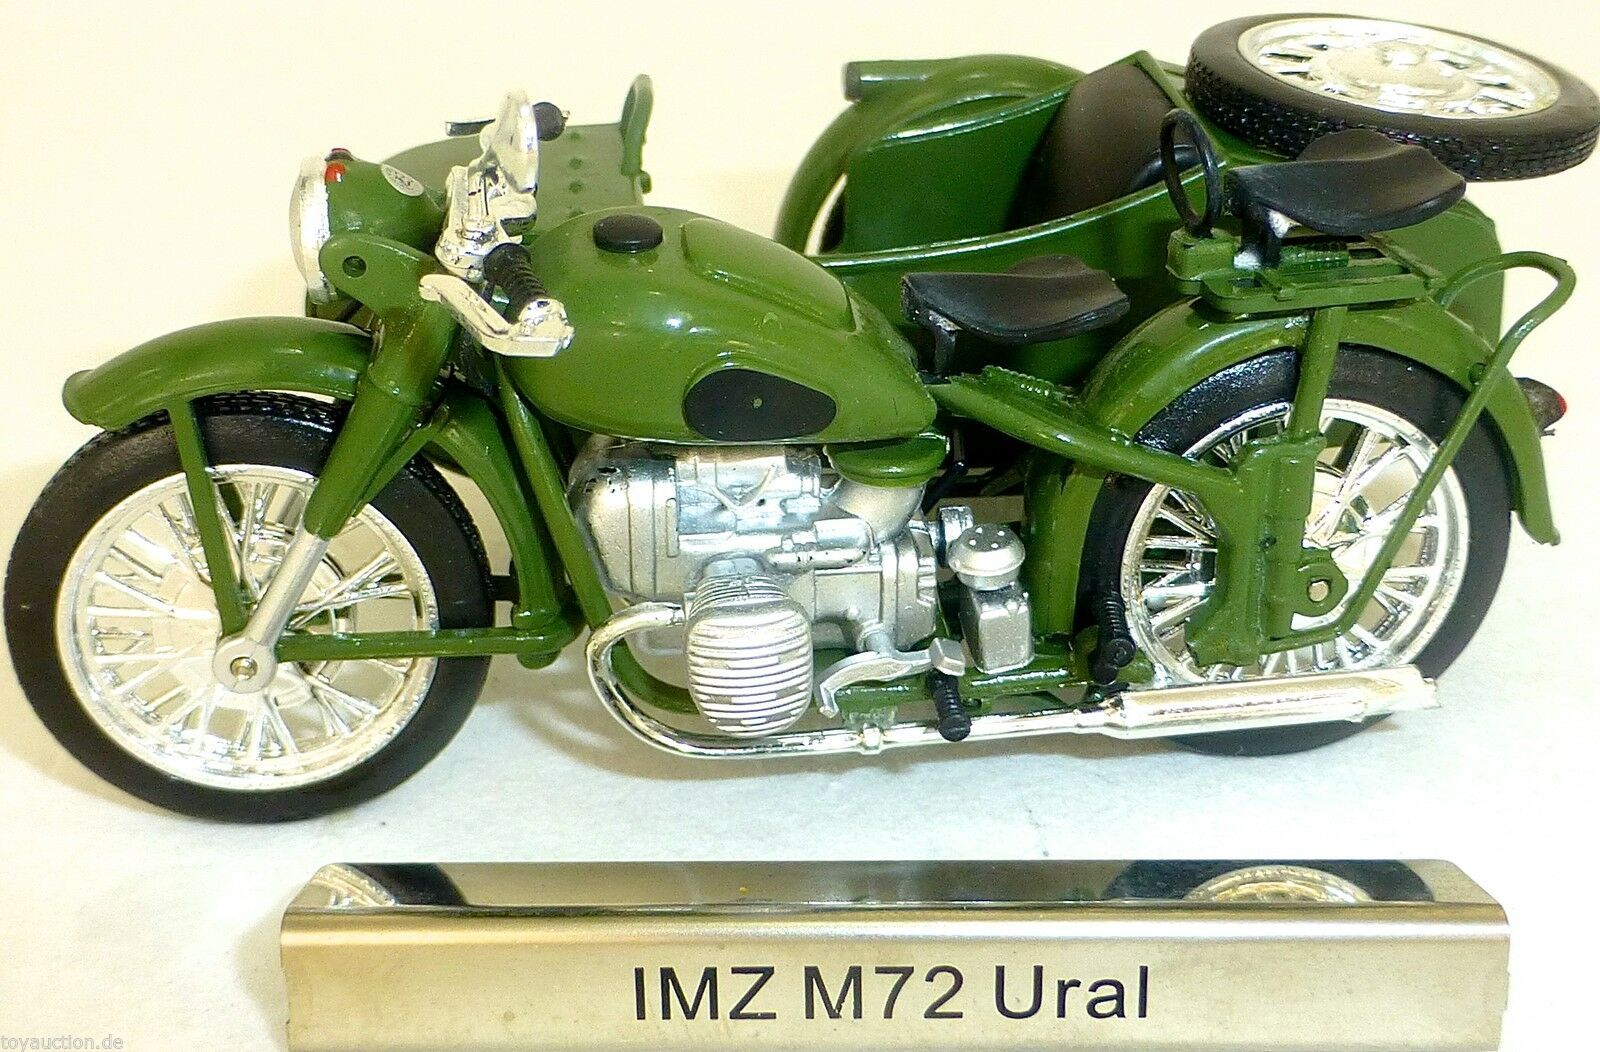 IMZ m72 ural motorcycle sidecar Green rda 1 24 Atlas 7168121 new EMB. orig. la2 μ